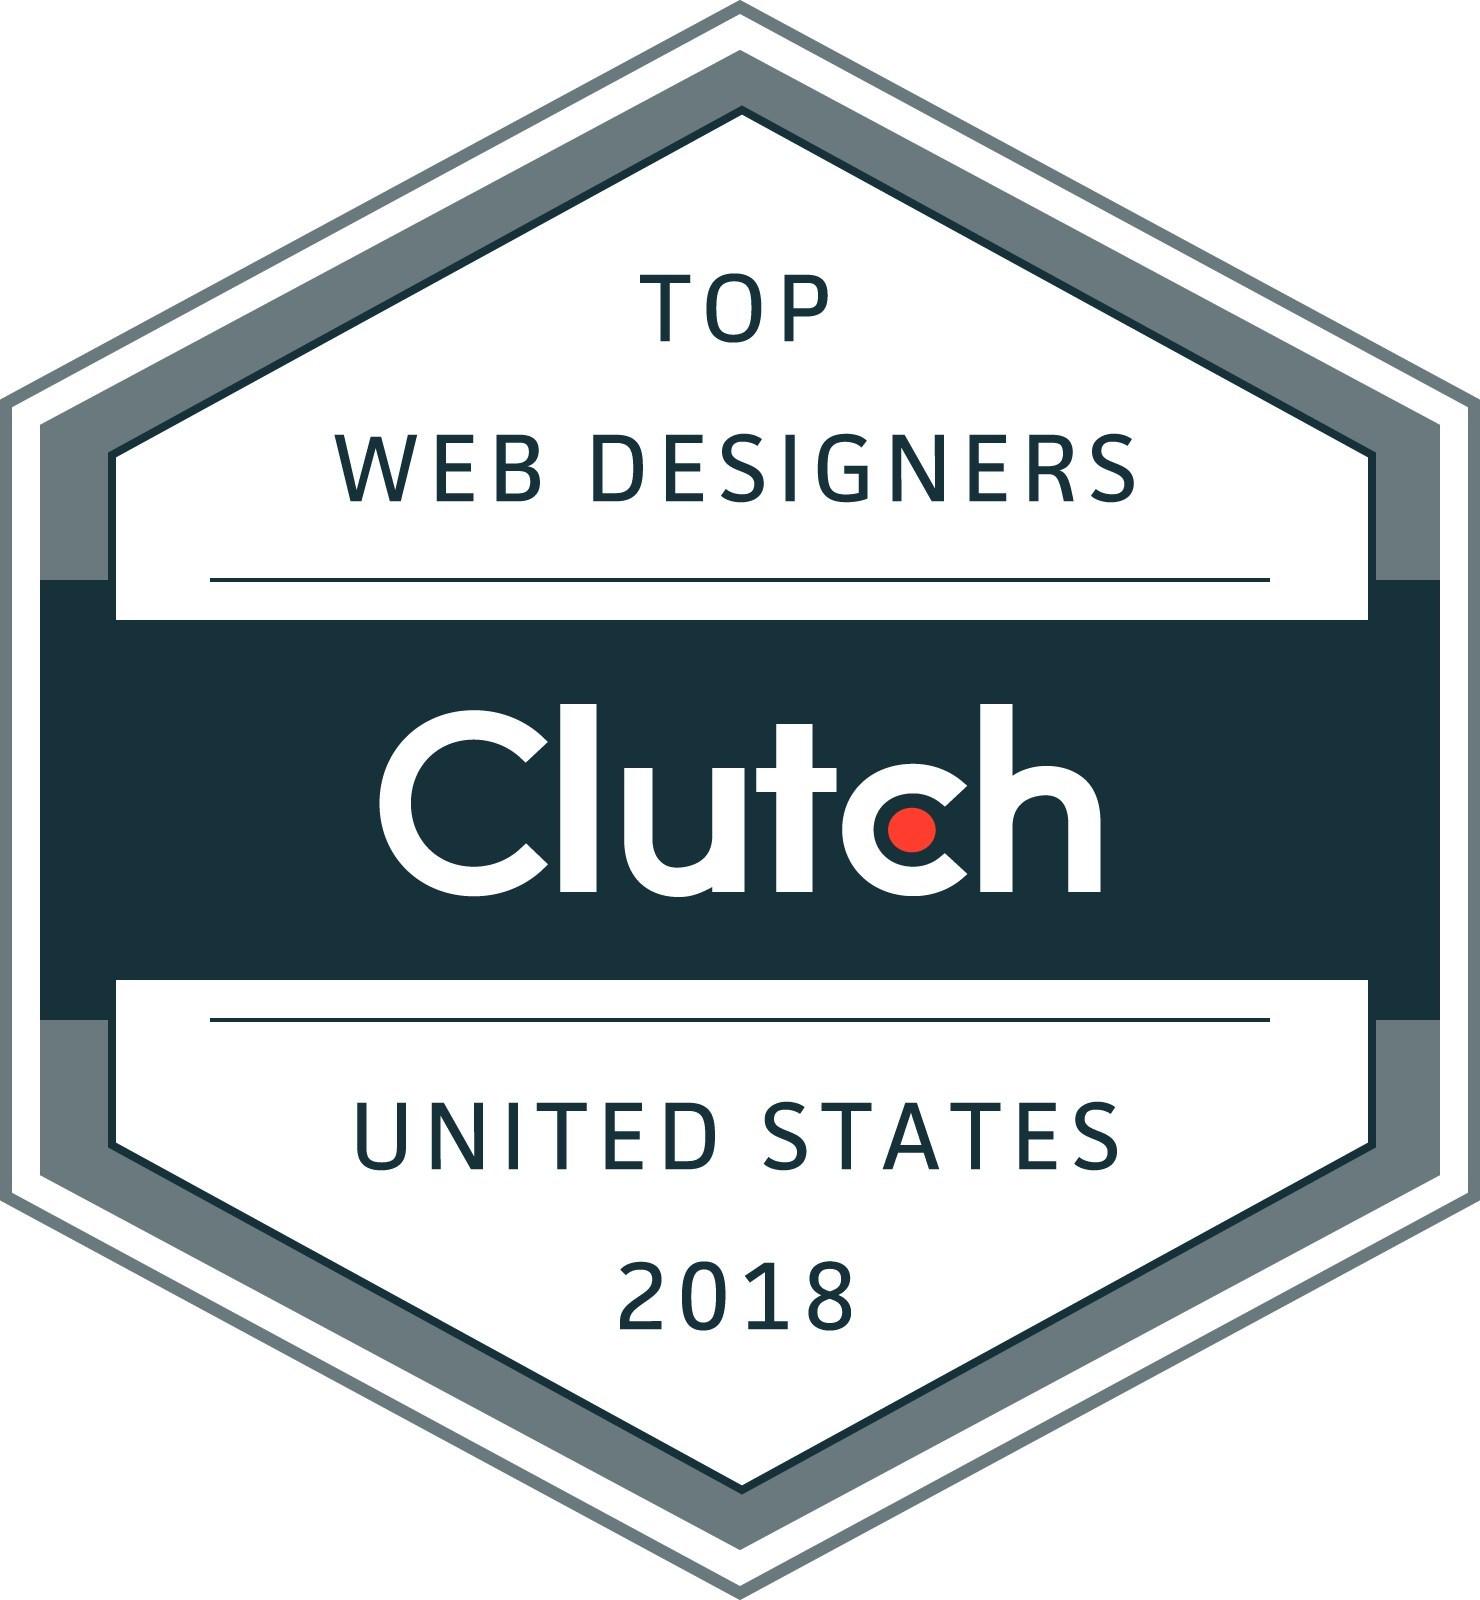 Top United States Web Designers 2018